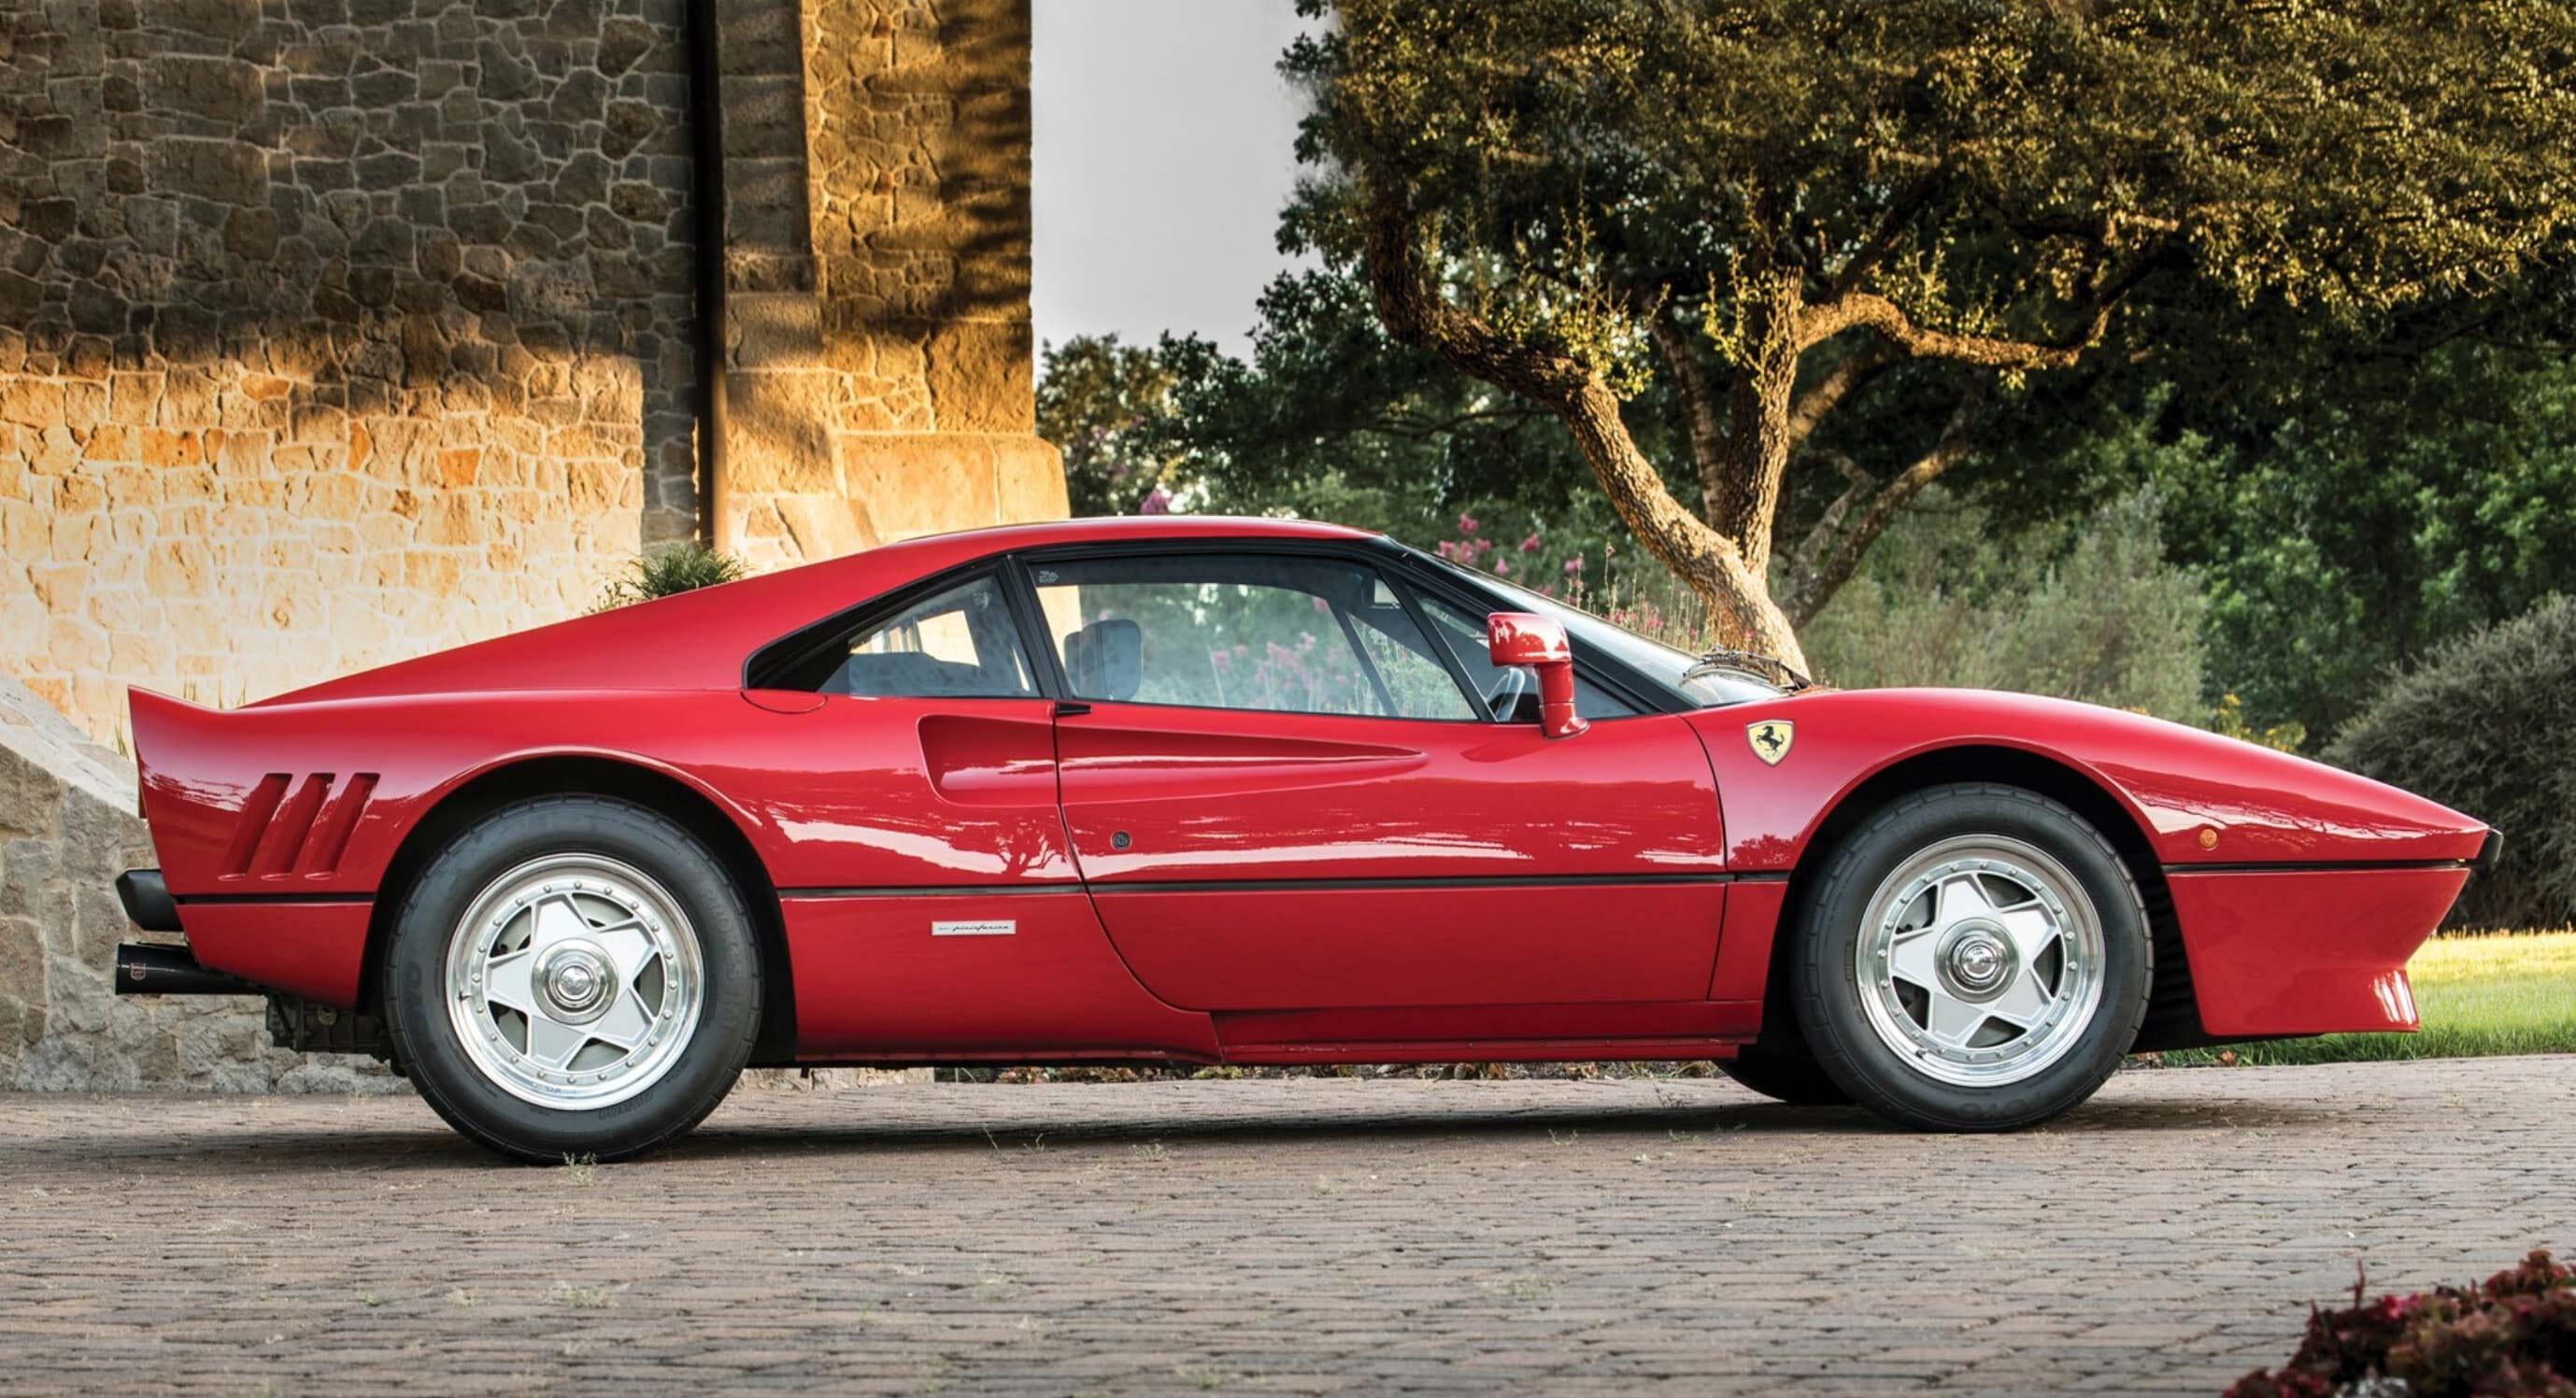 The 1985 Ferrari 288 GTO Proved Itself Off The Track